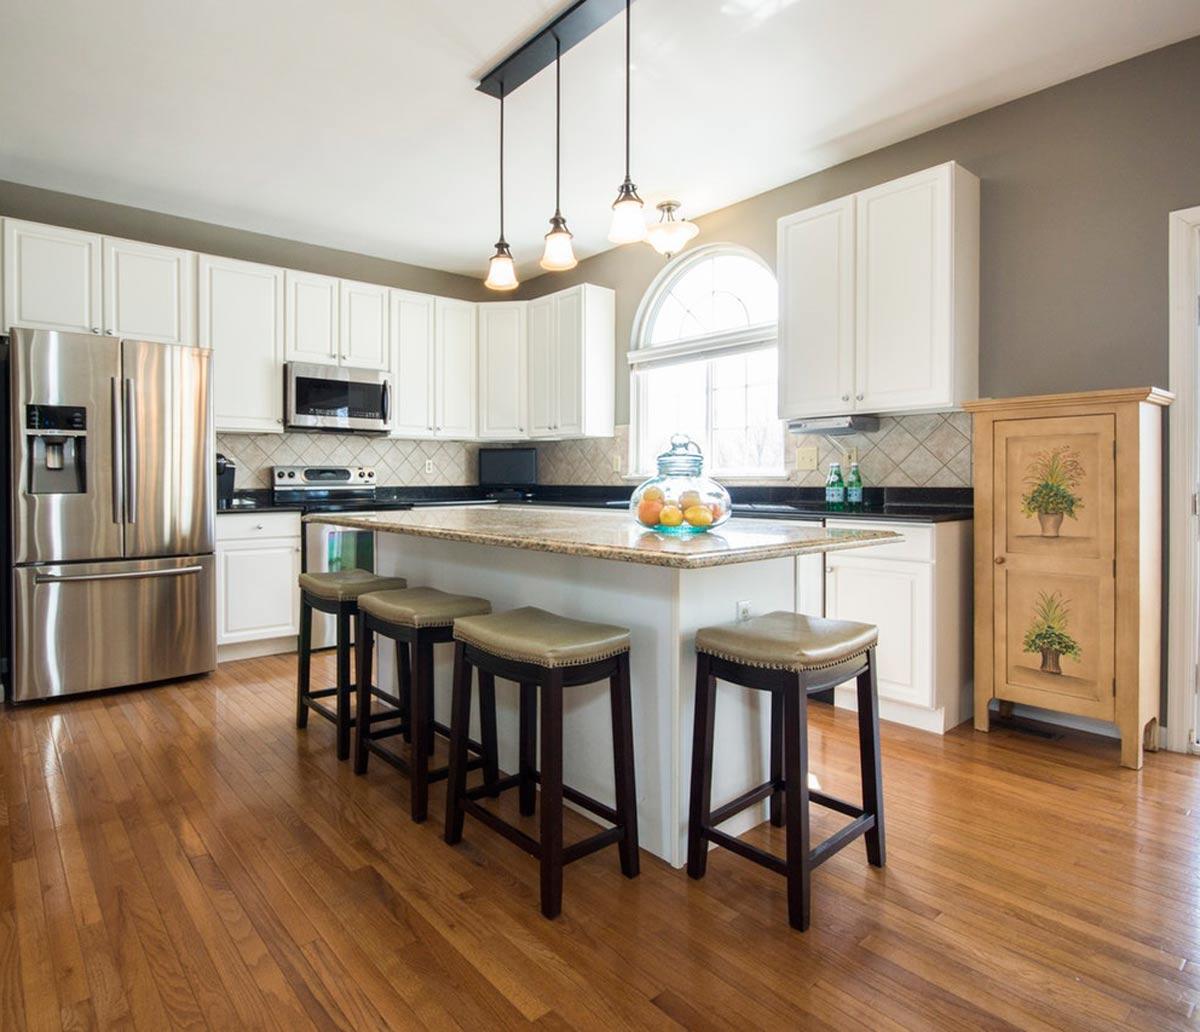 decor ashpazkhane - اصول طراحی آشپزخانه